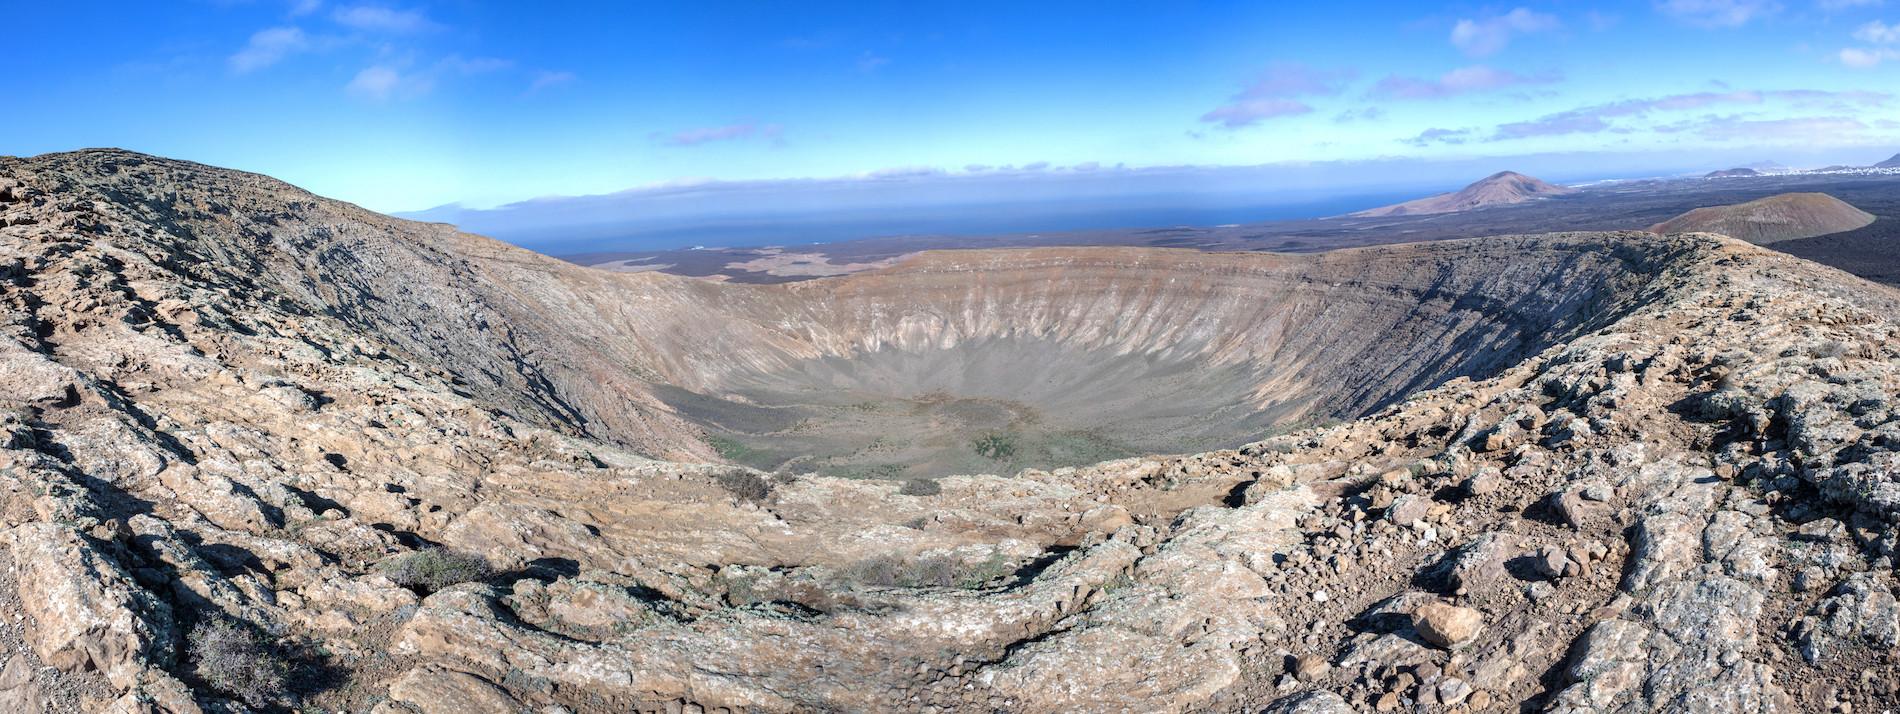 PHOTO Lanzarote Caldera Blanca panoramique